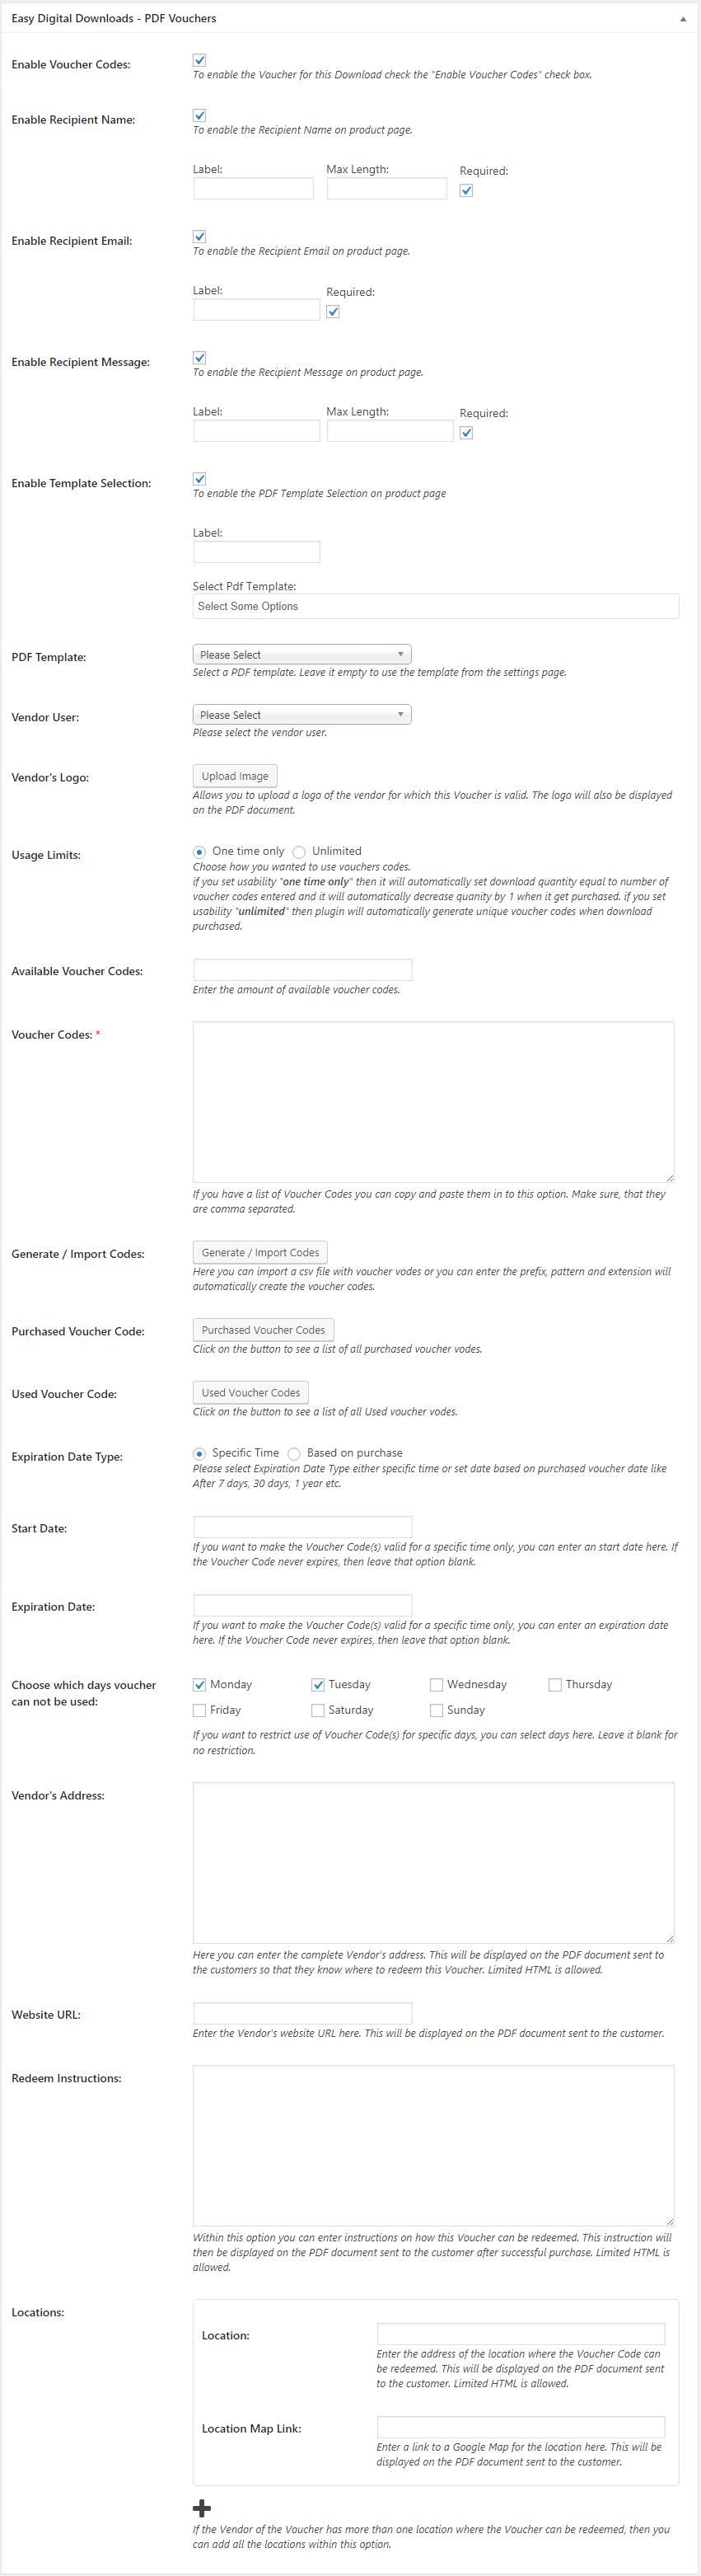 Metabox settings